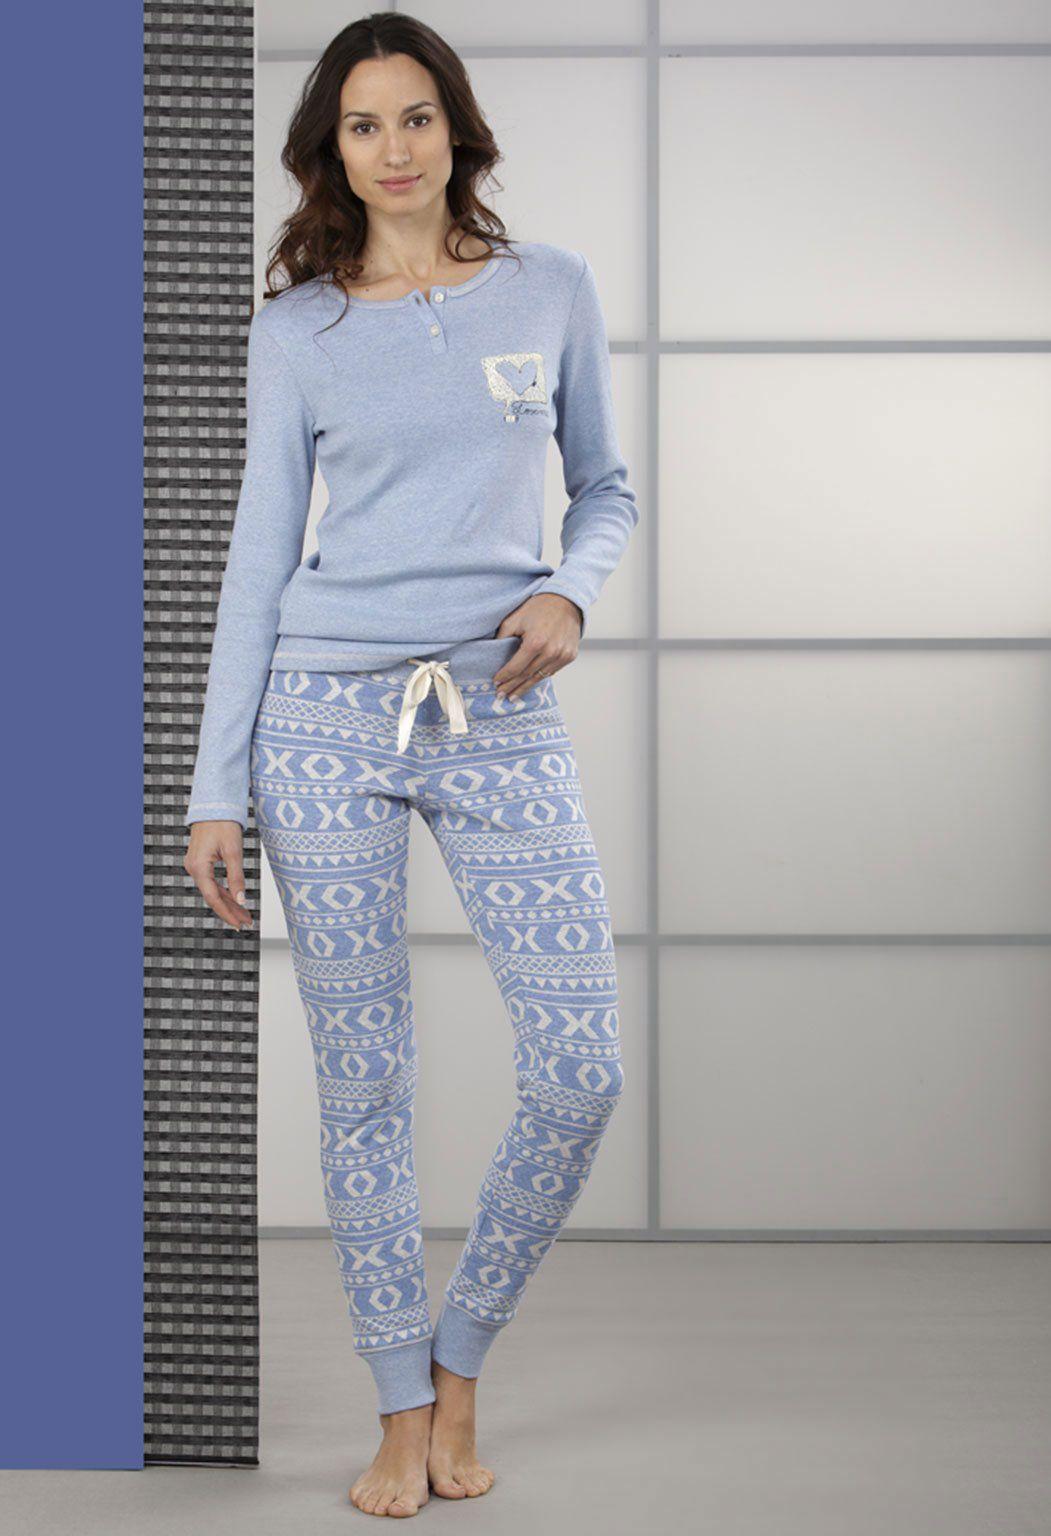 3eefda6a2 Pijama inverno mujer by Massana. Pantalón legging con puño